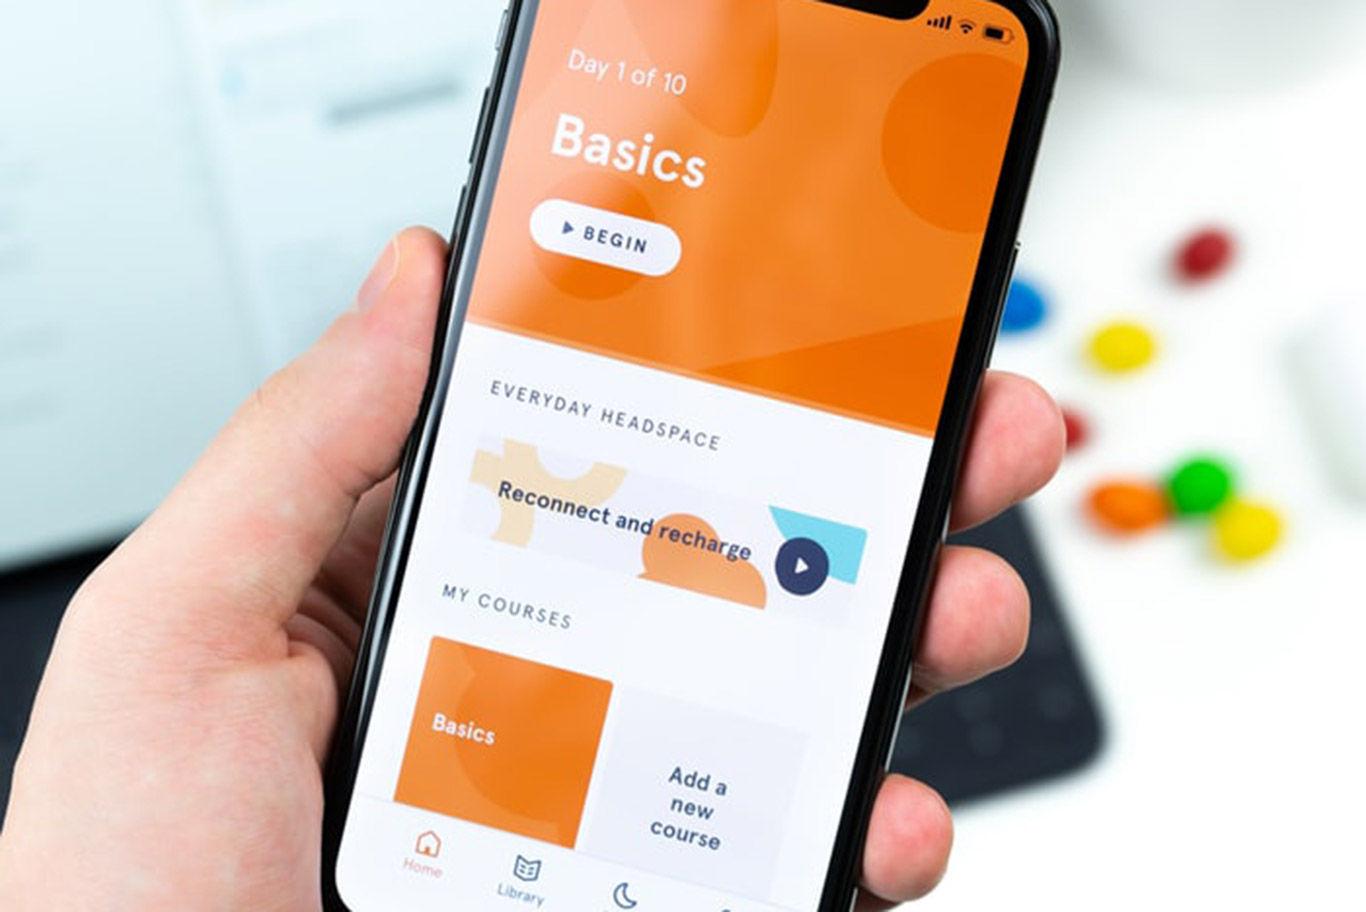 Basics iphone user